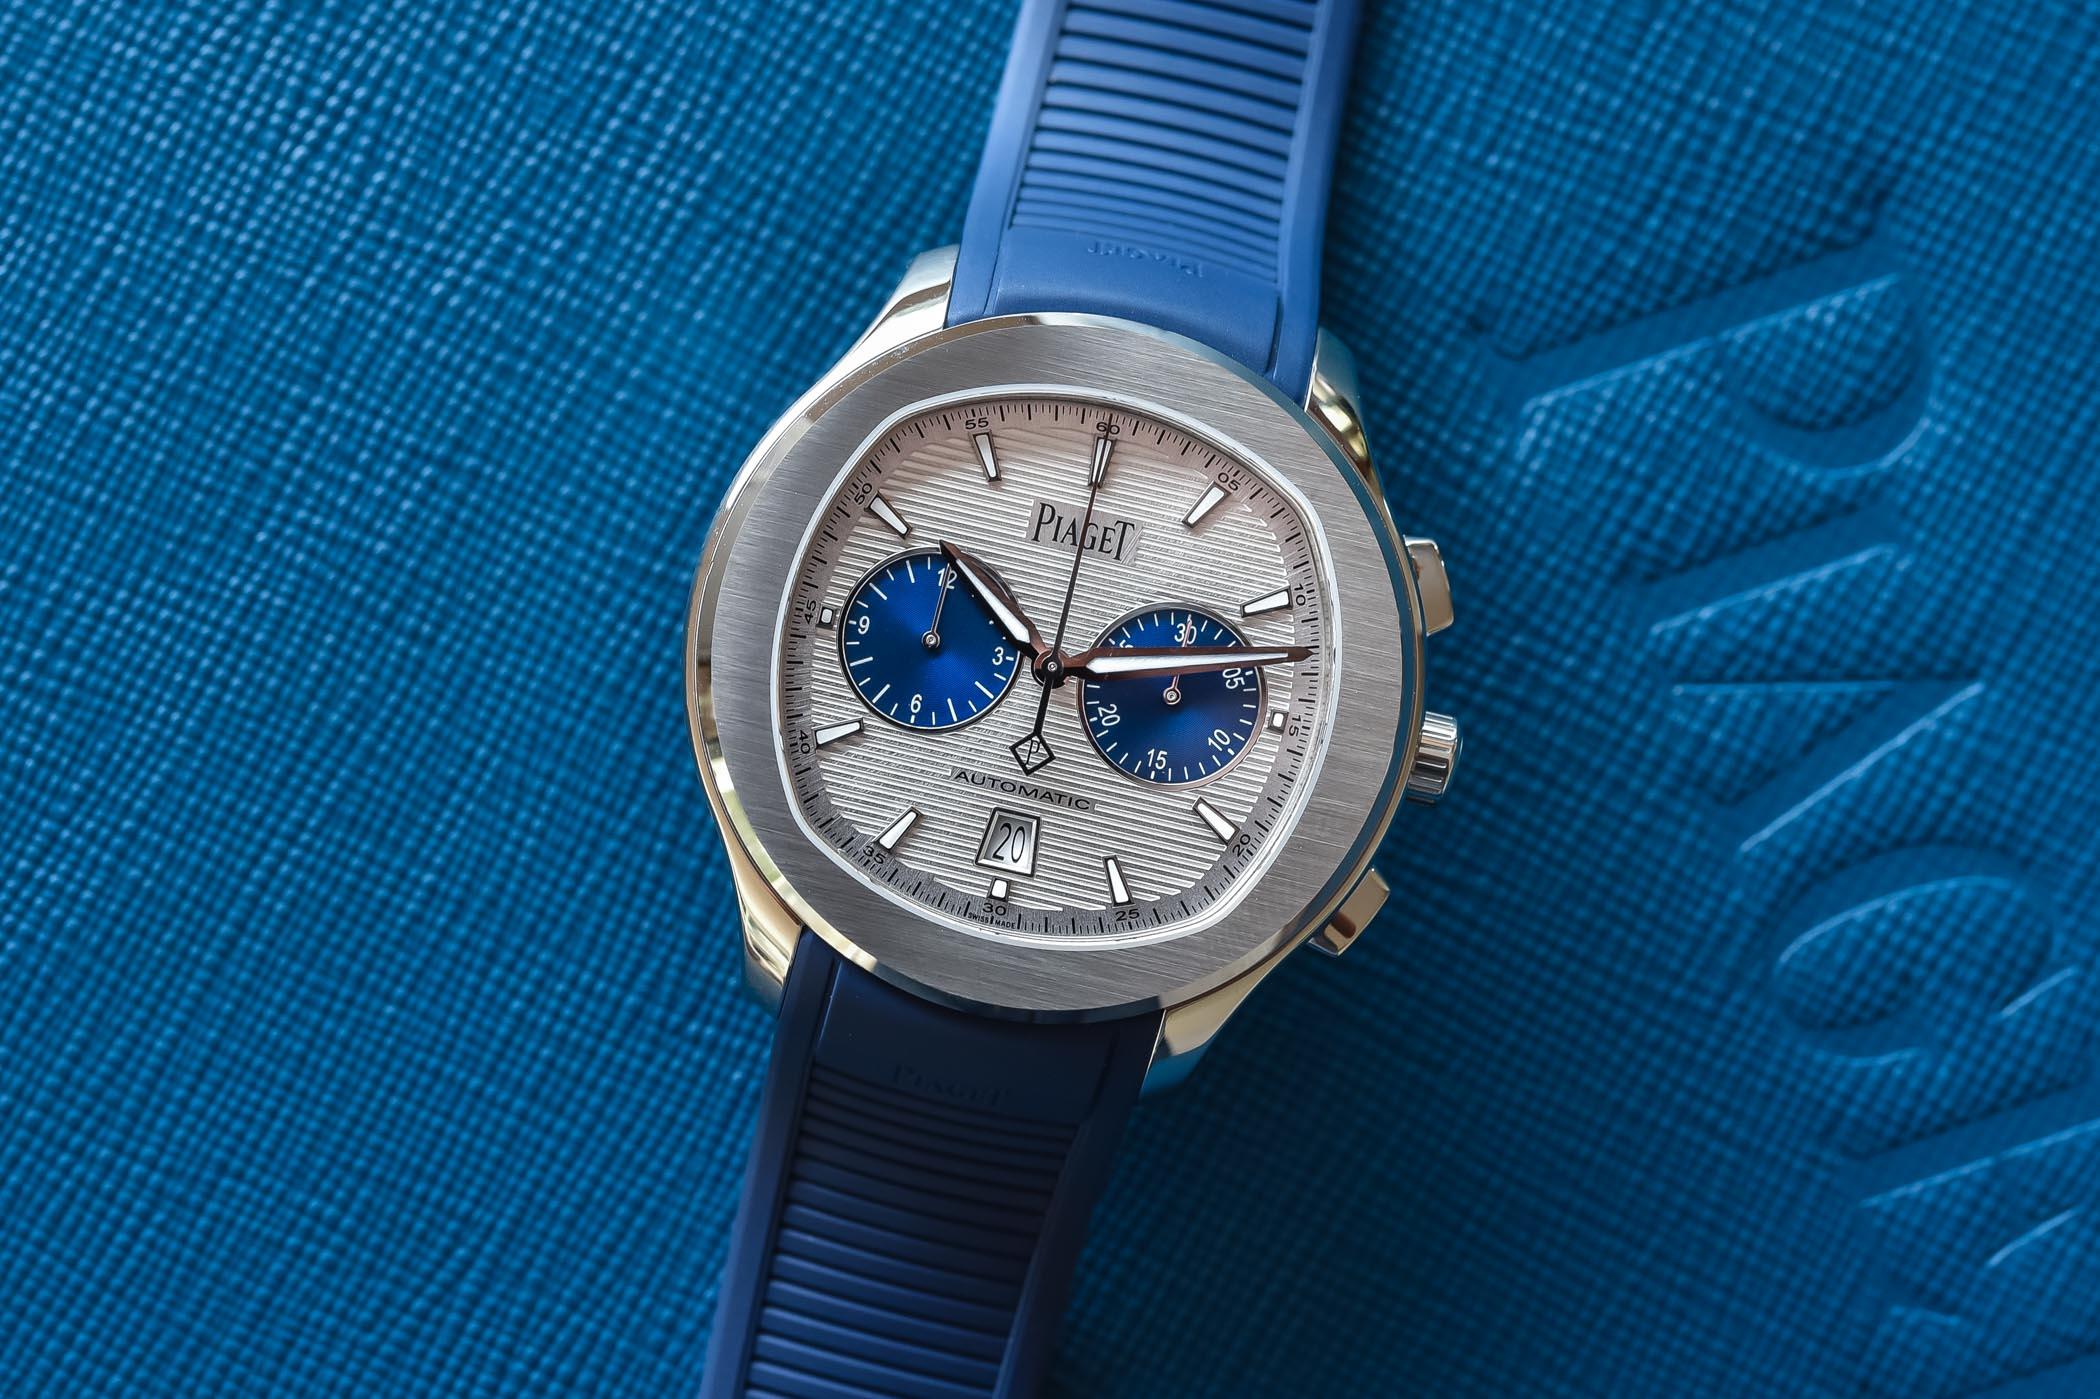 Piaget Polo Blue Panda Automatic Chronograph 42mm Rubber Strap G0A46013